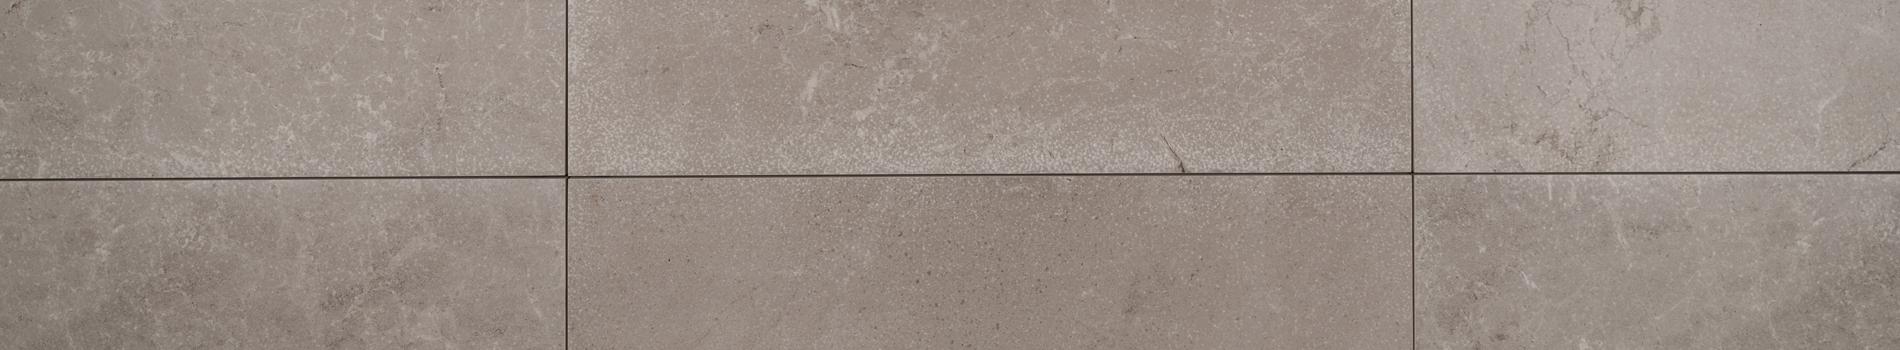 20mm Tumbled Edge Ash Design Variation